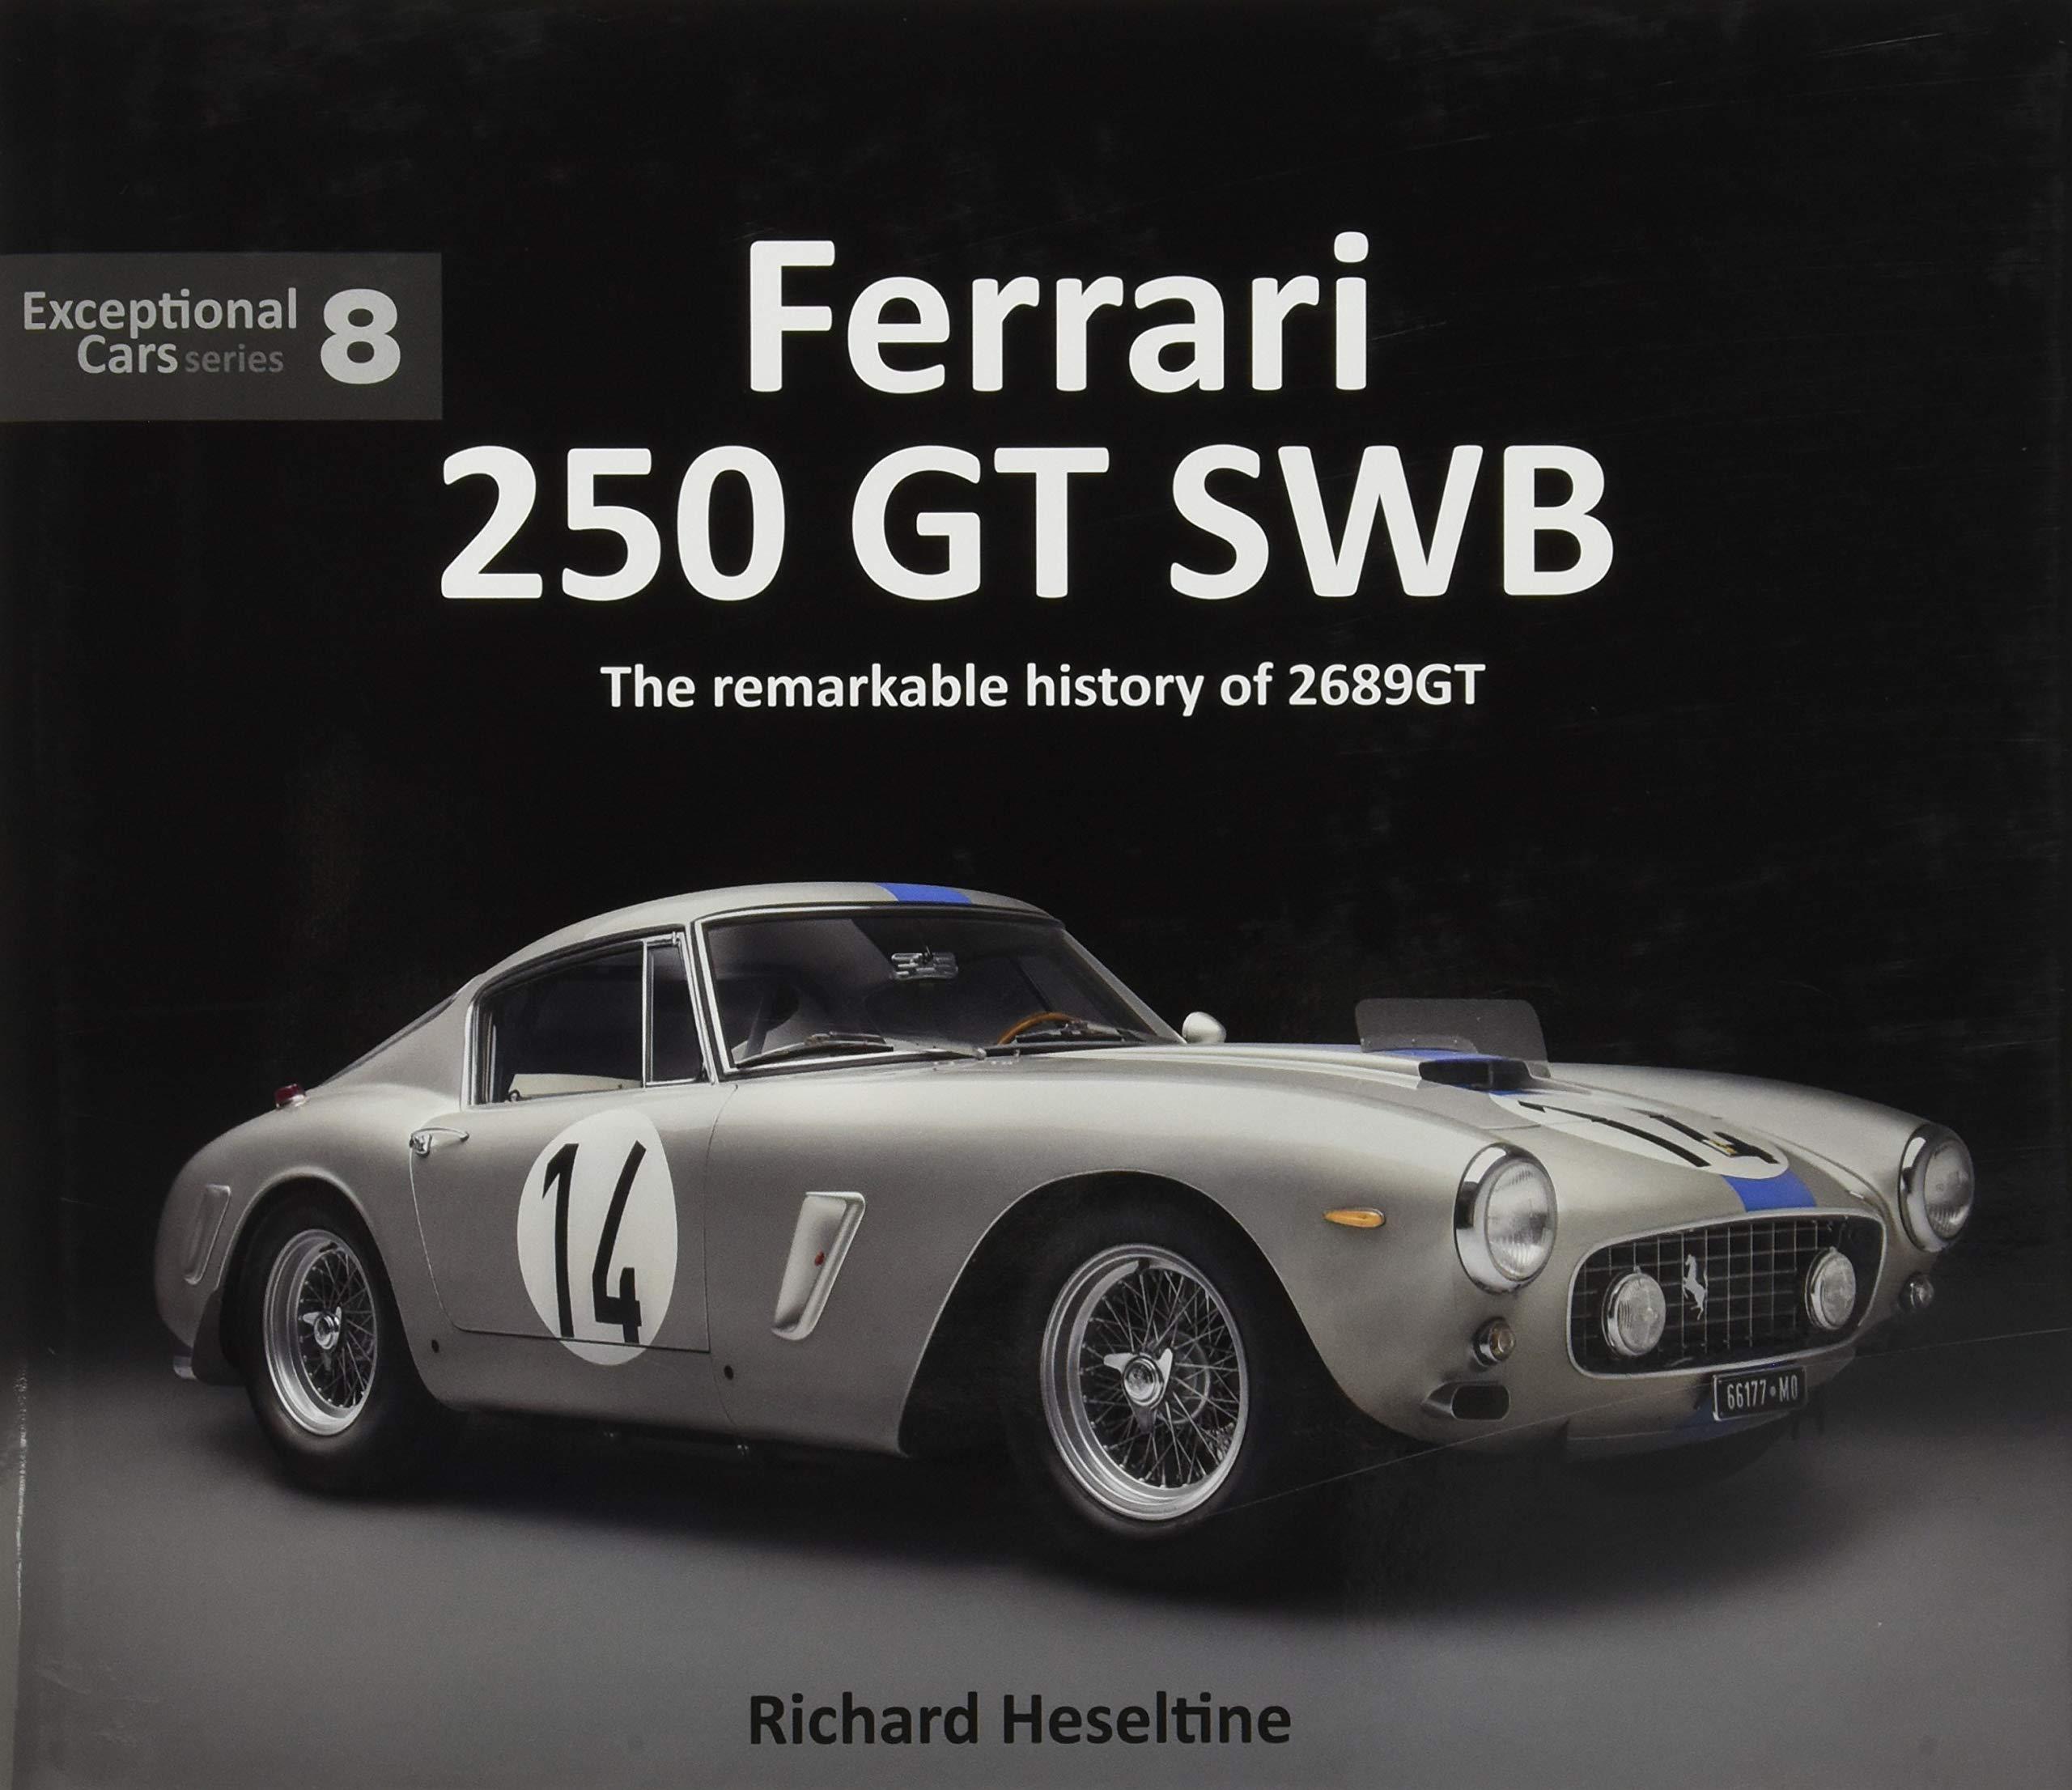 Ferrari 250 Gt Swb The Remarkable History Of 2689 Exceptional Cars Band 8 Amazon De Heseltine Richard Fremdsprachige Bücher